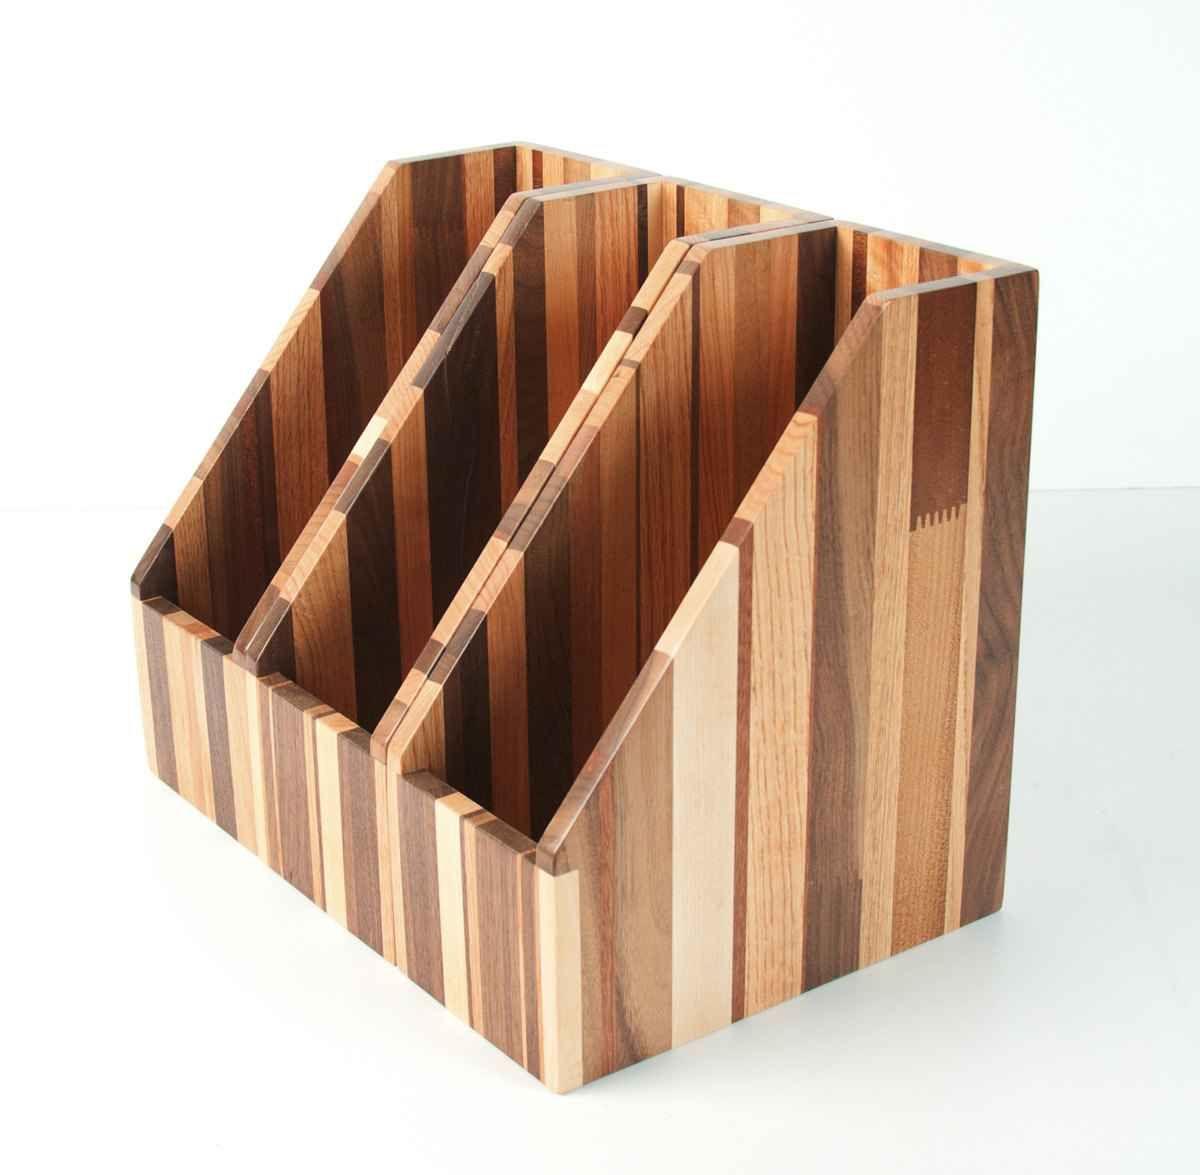 File Magazine Holder For Easy Organizing | Office ...